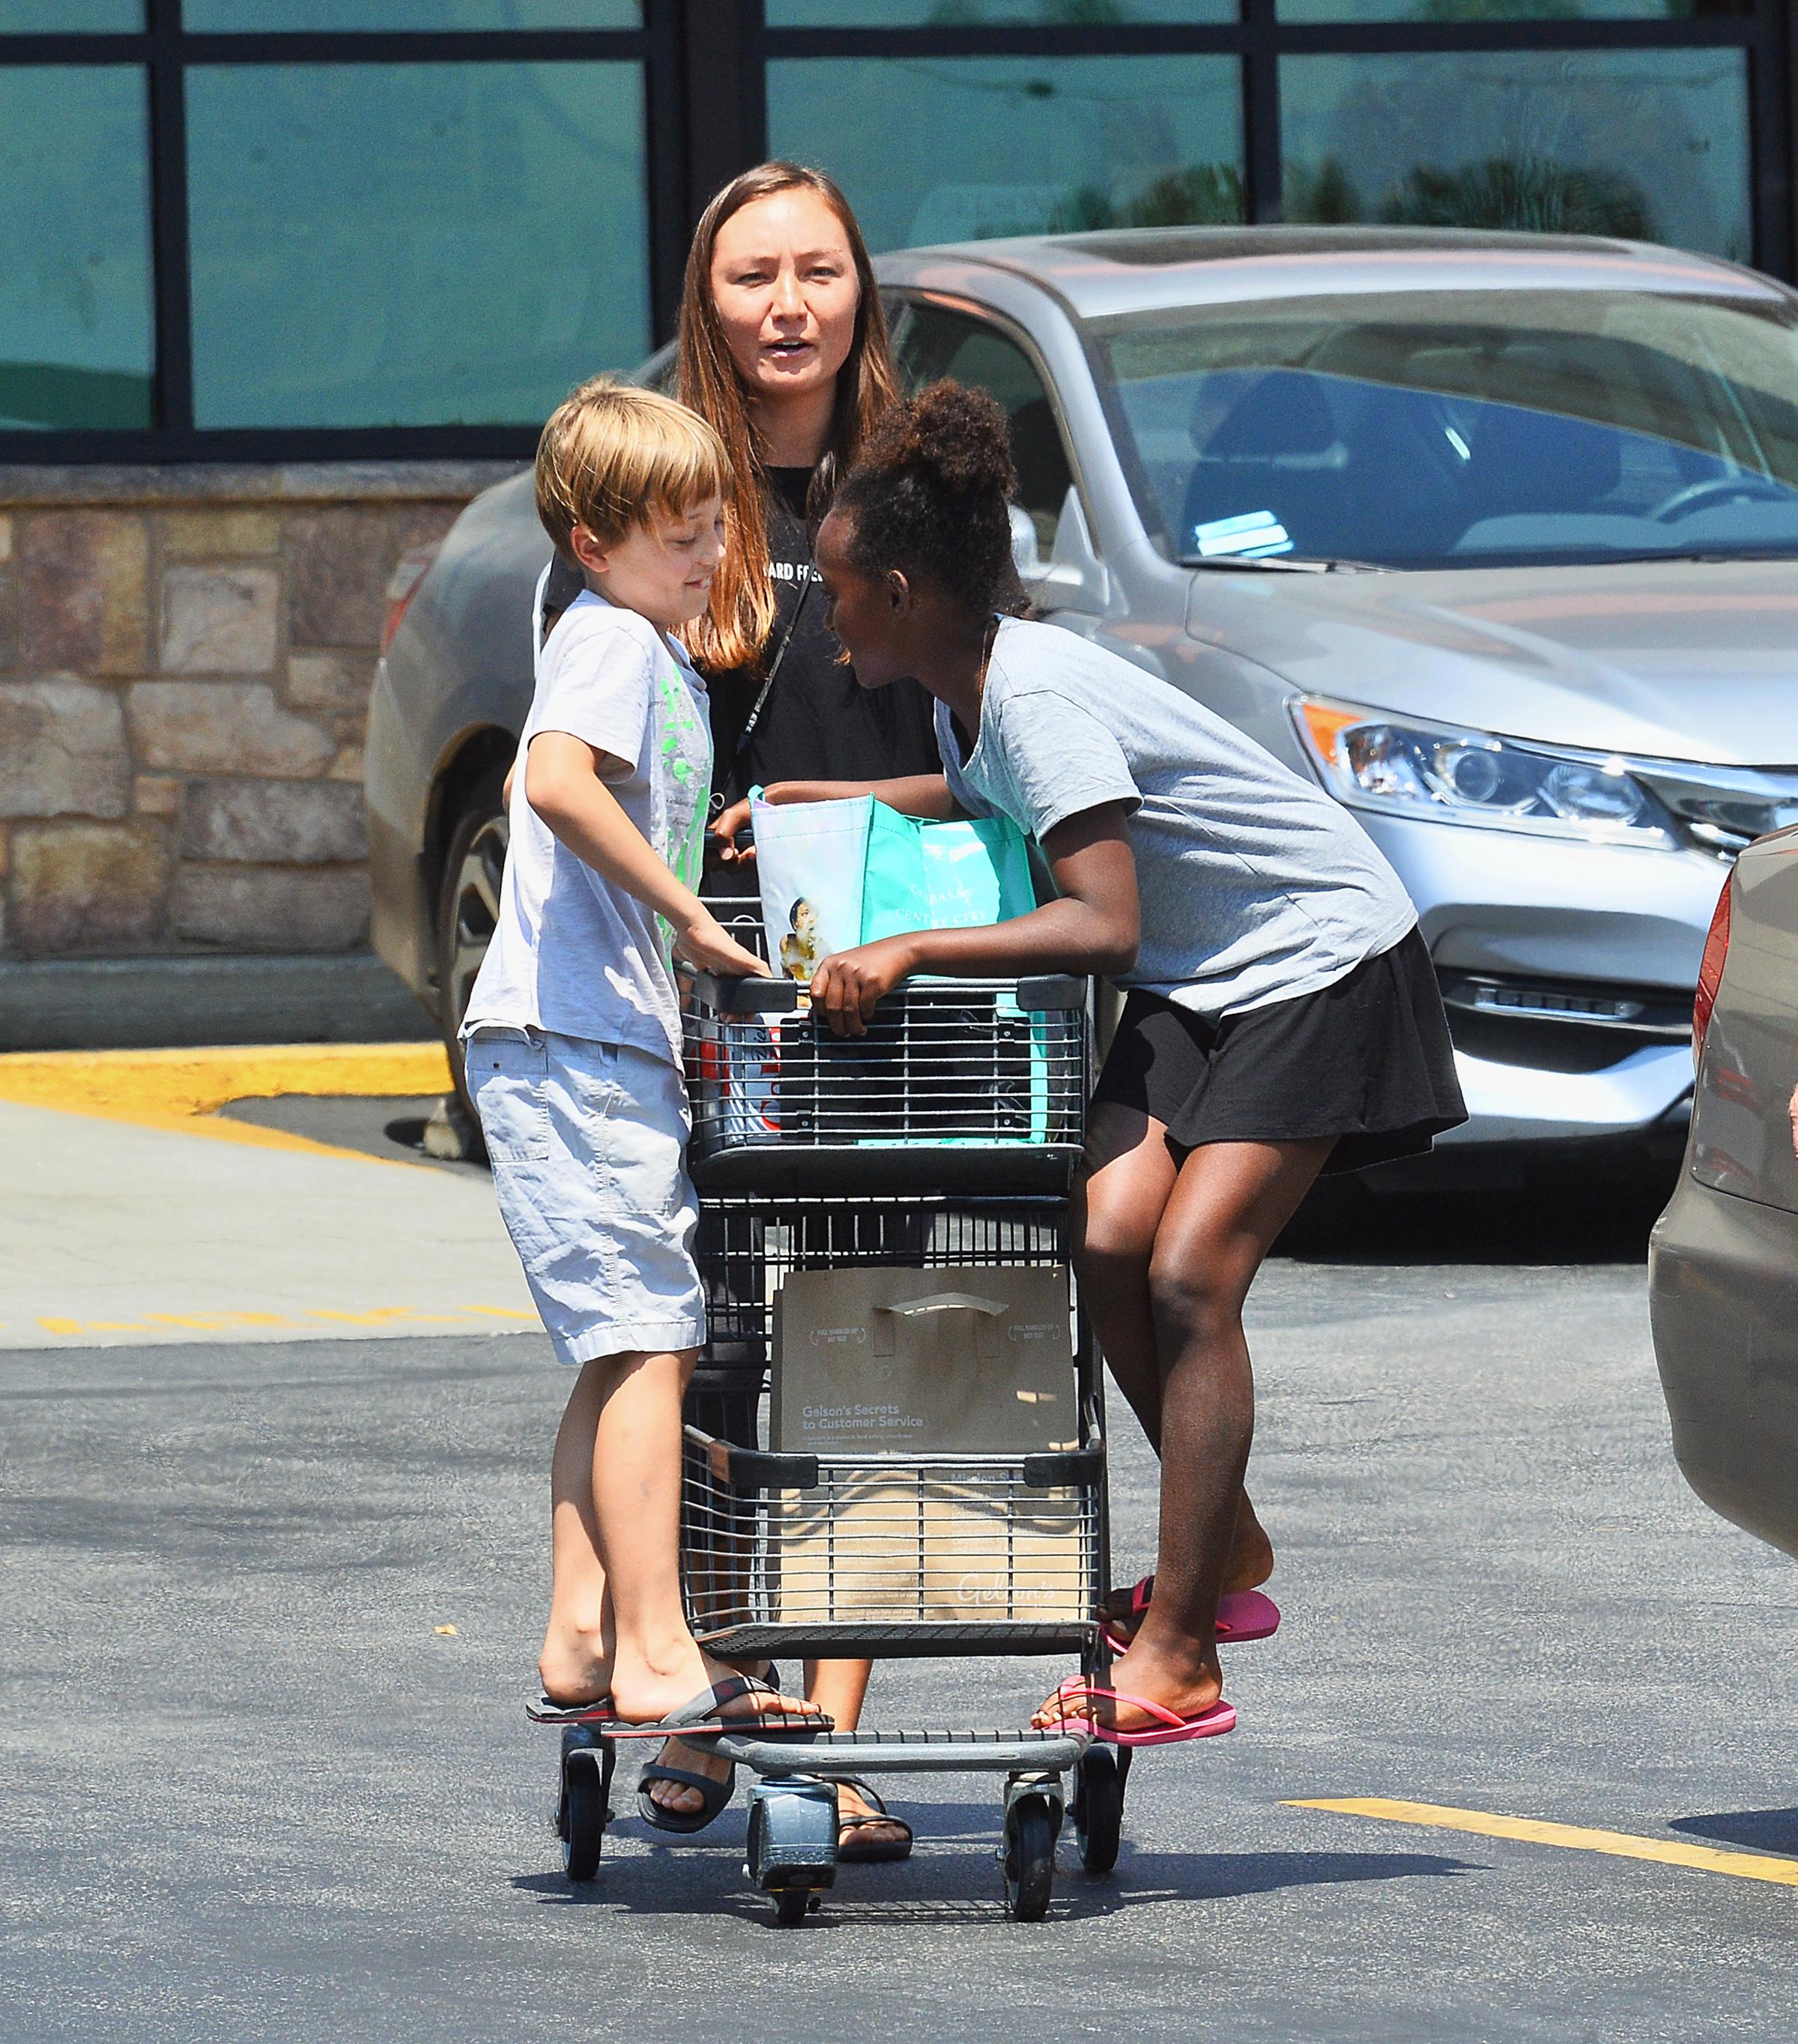 Zahara Y Knox Jolie-Pitt Se Divierten Con La Niñera